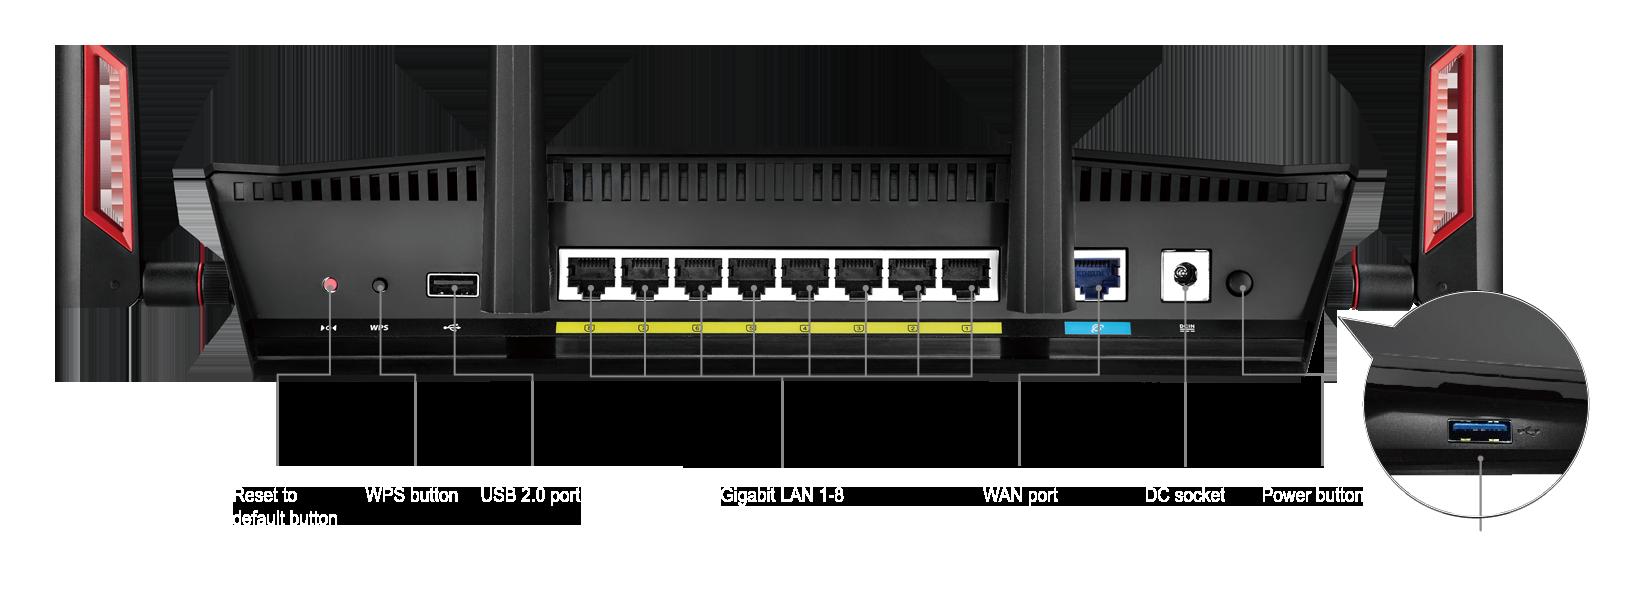 RT-AC88U | Networking